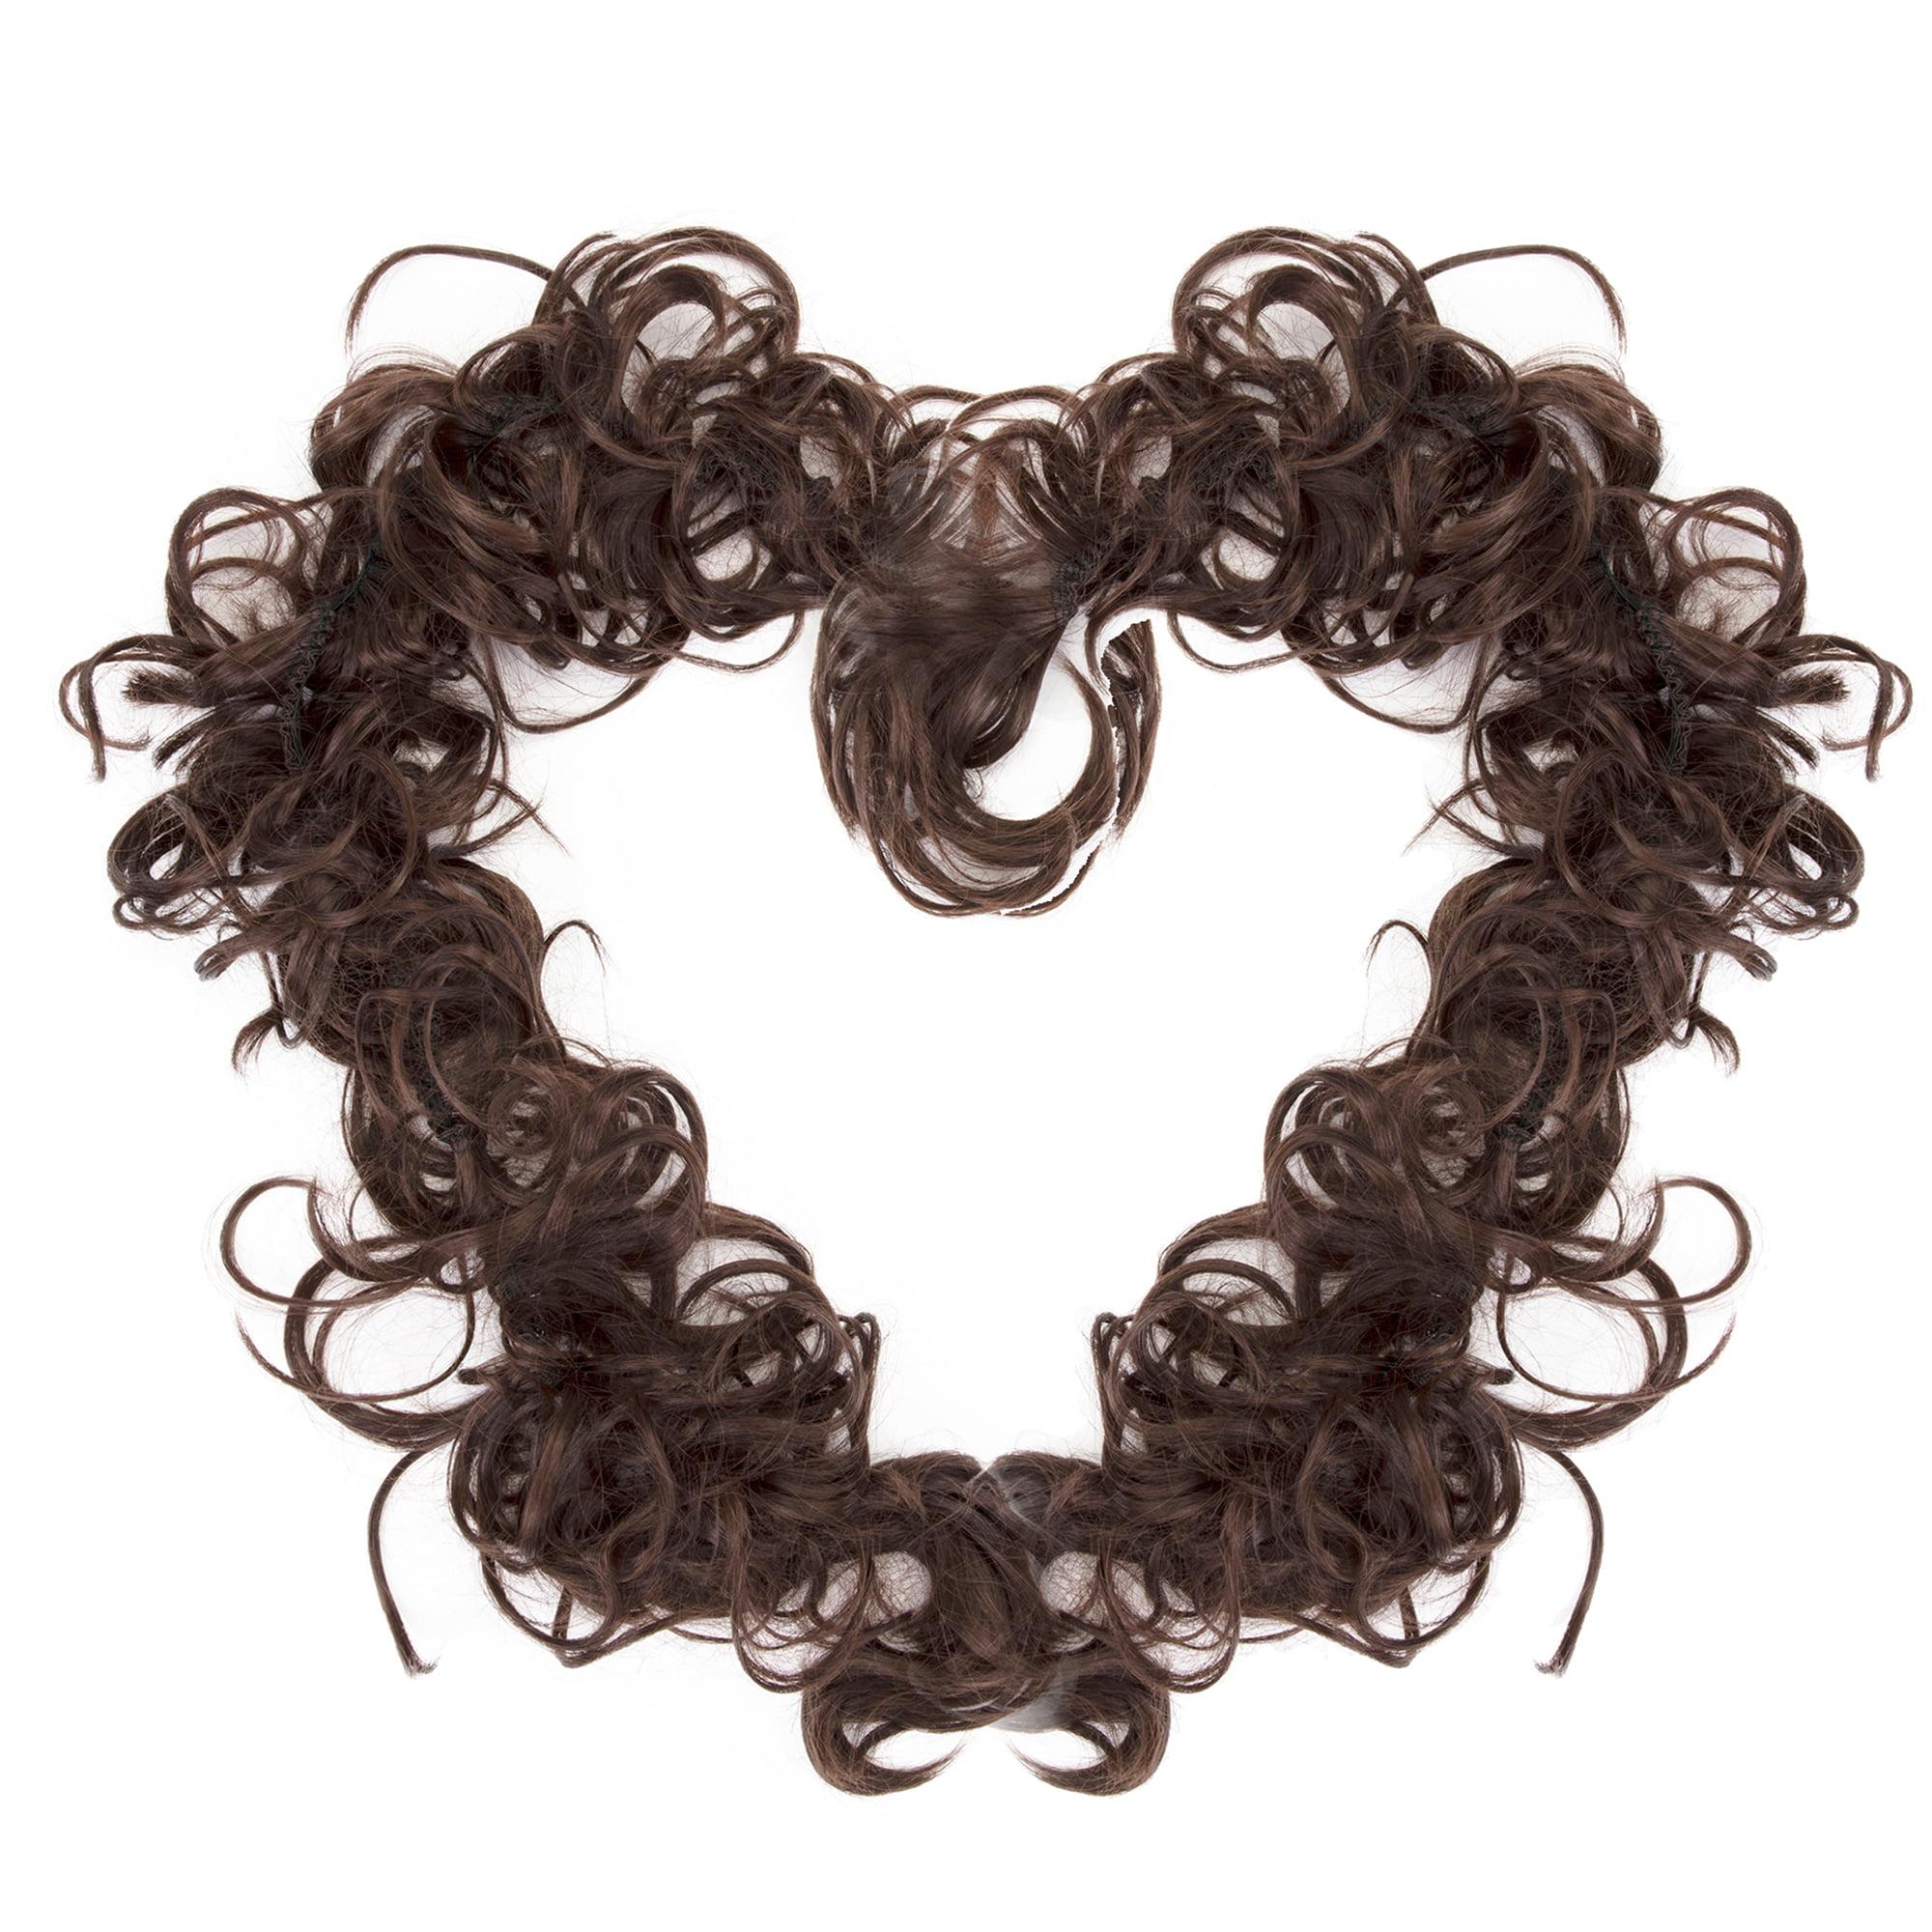 Medium Brown Hair Extensions Wedding Elastic Band Curly Updo